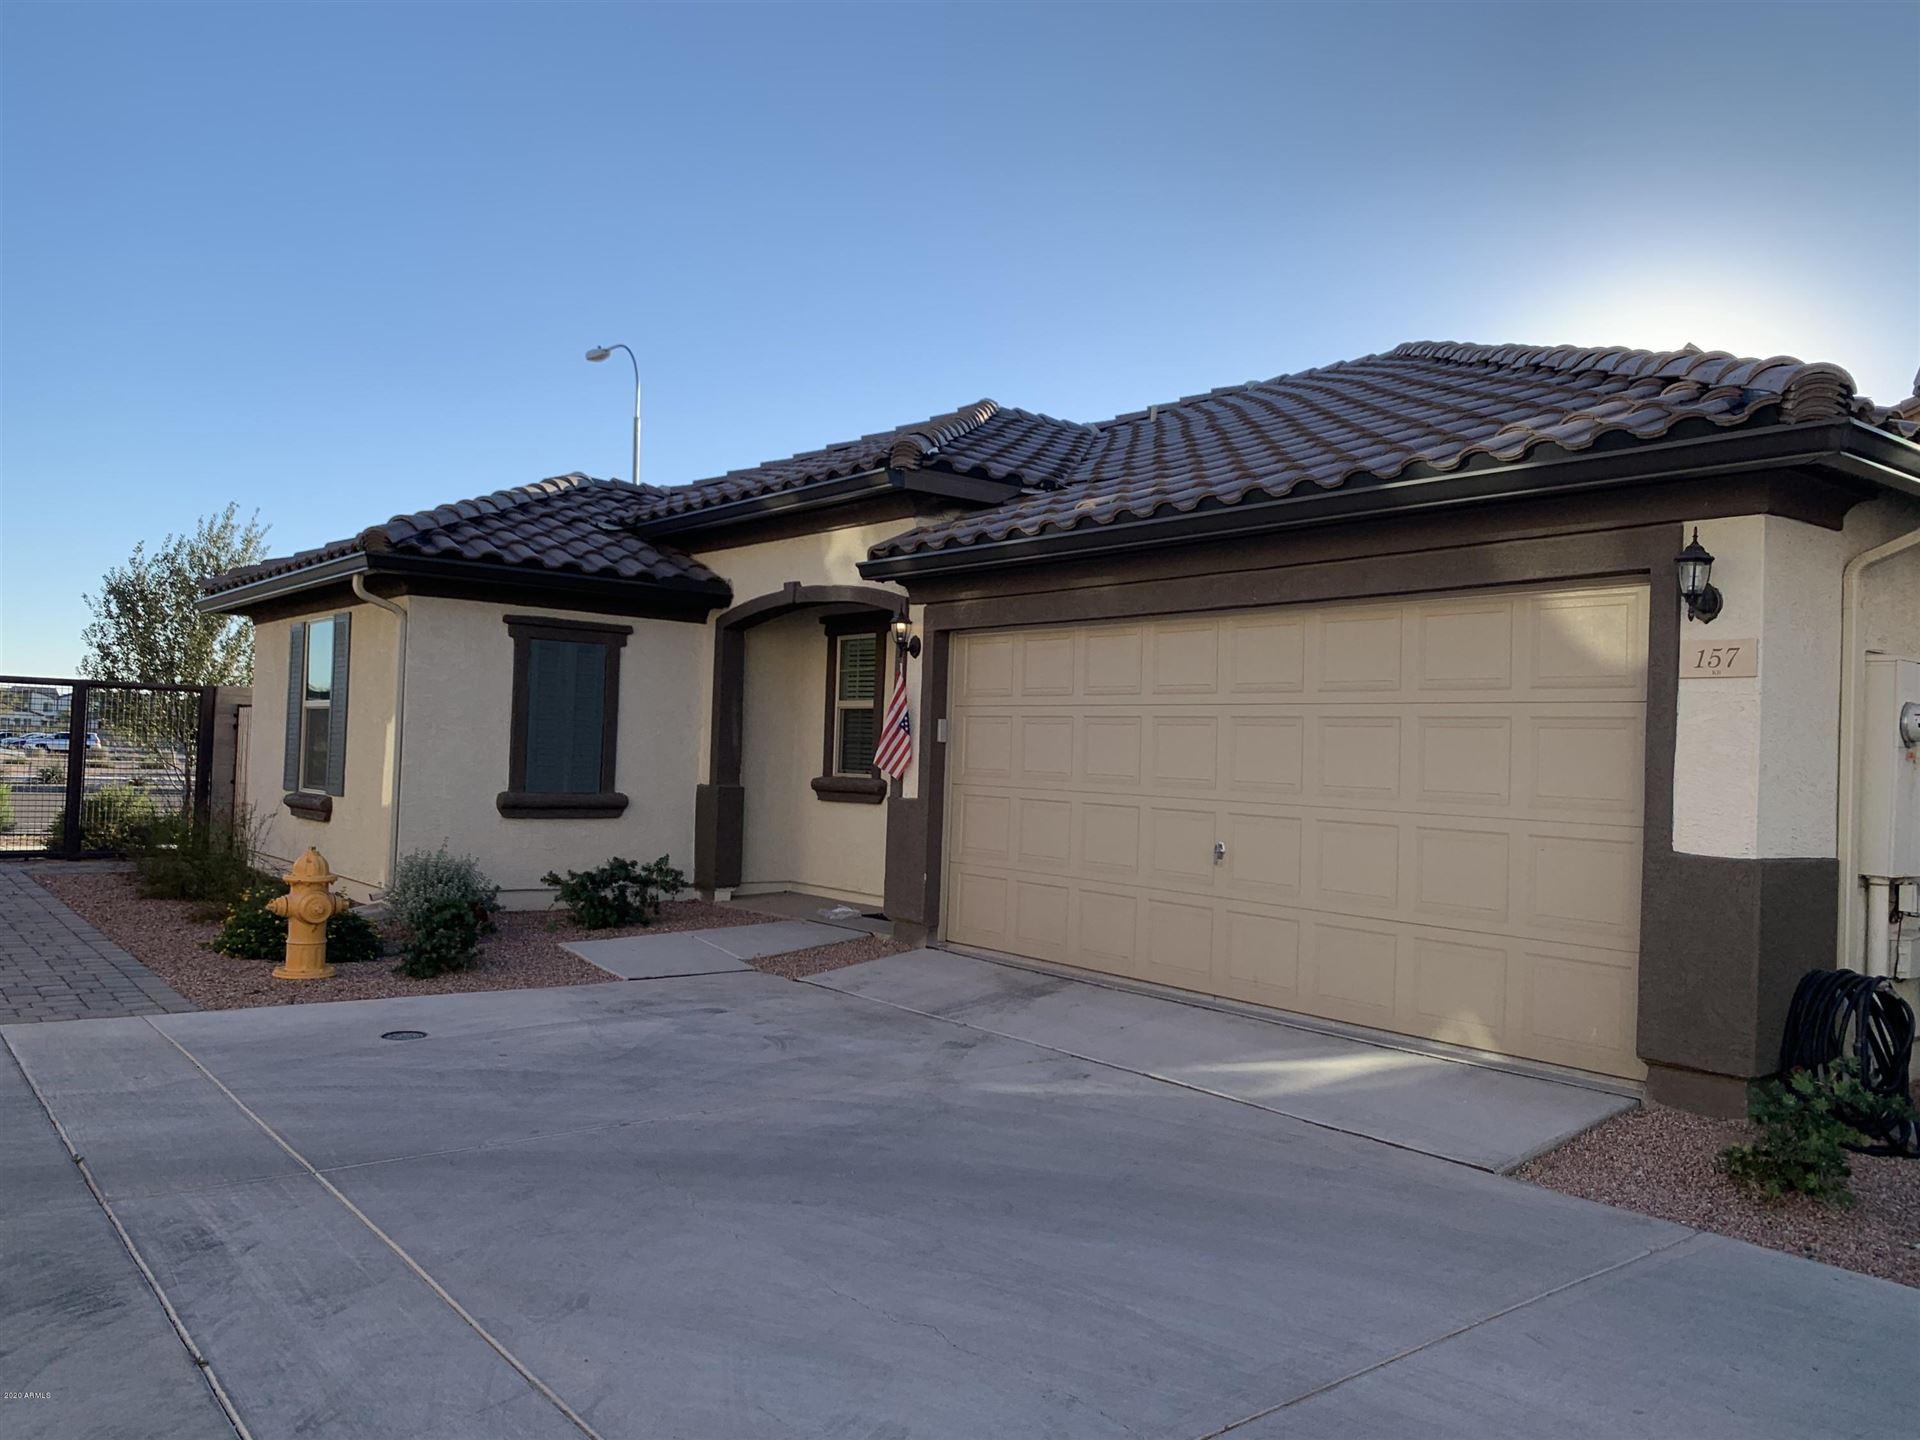 157 E BLUEJAY Drive, Chandler, AZ 85286 - MLS#: 6263556